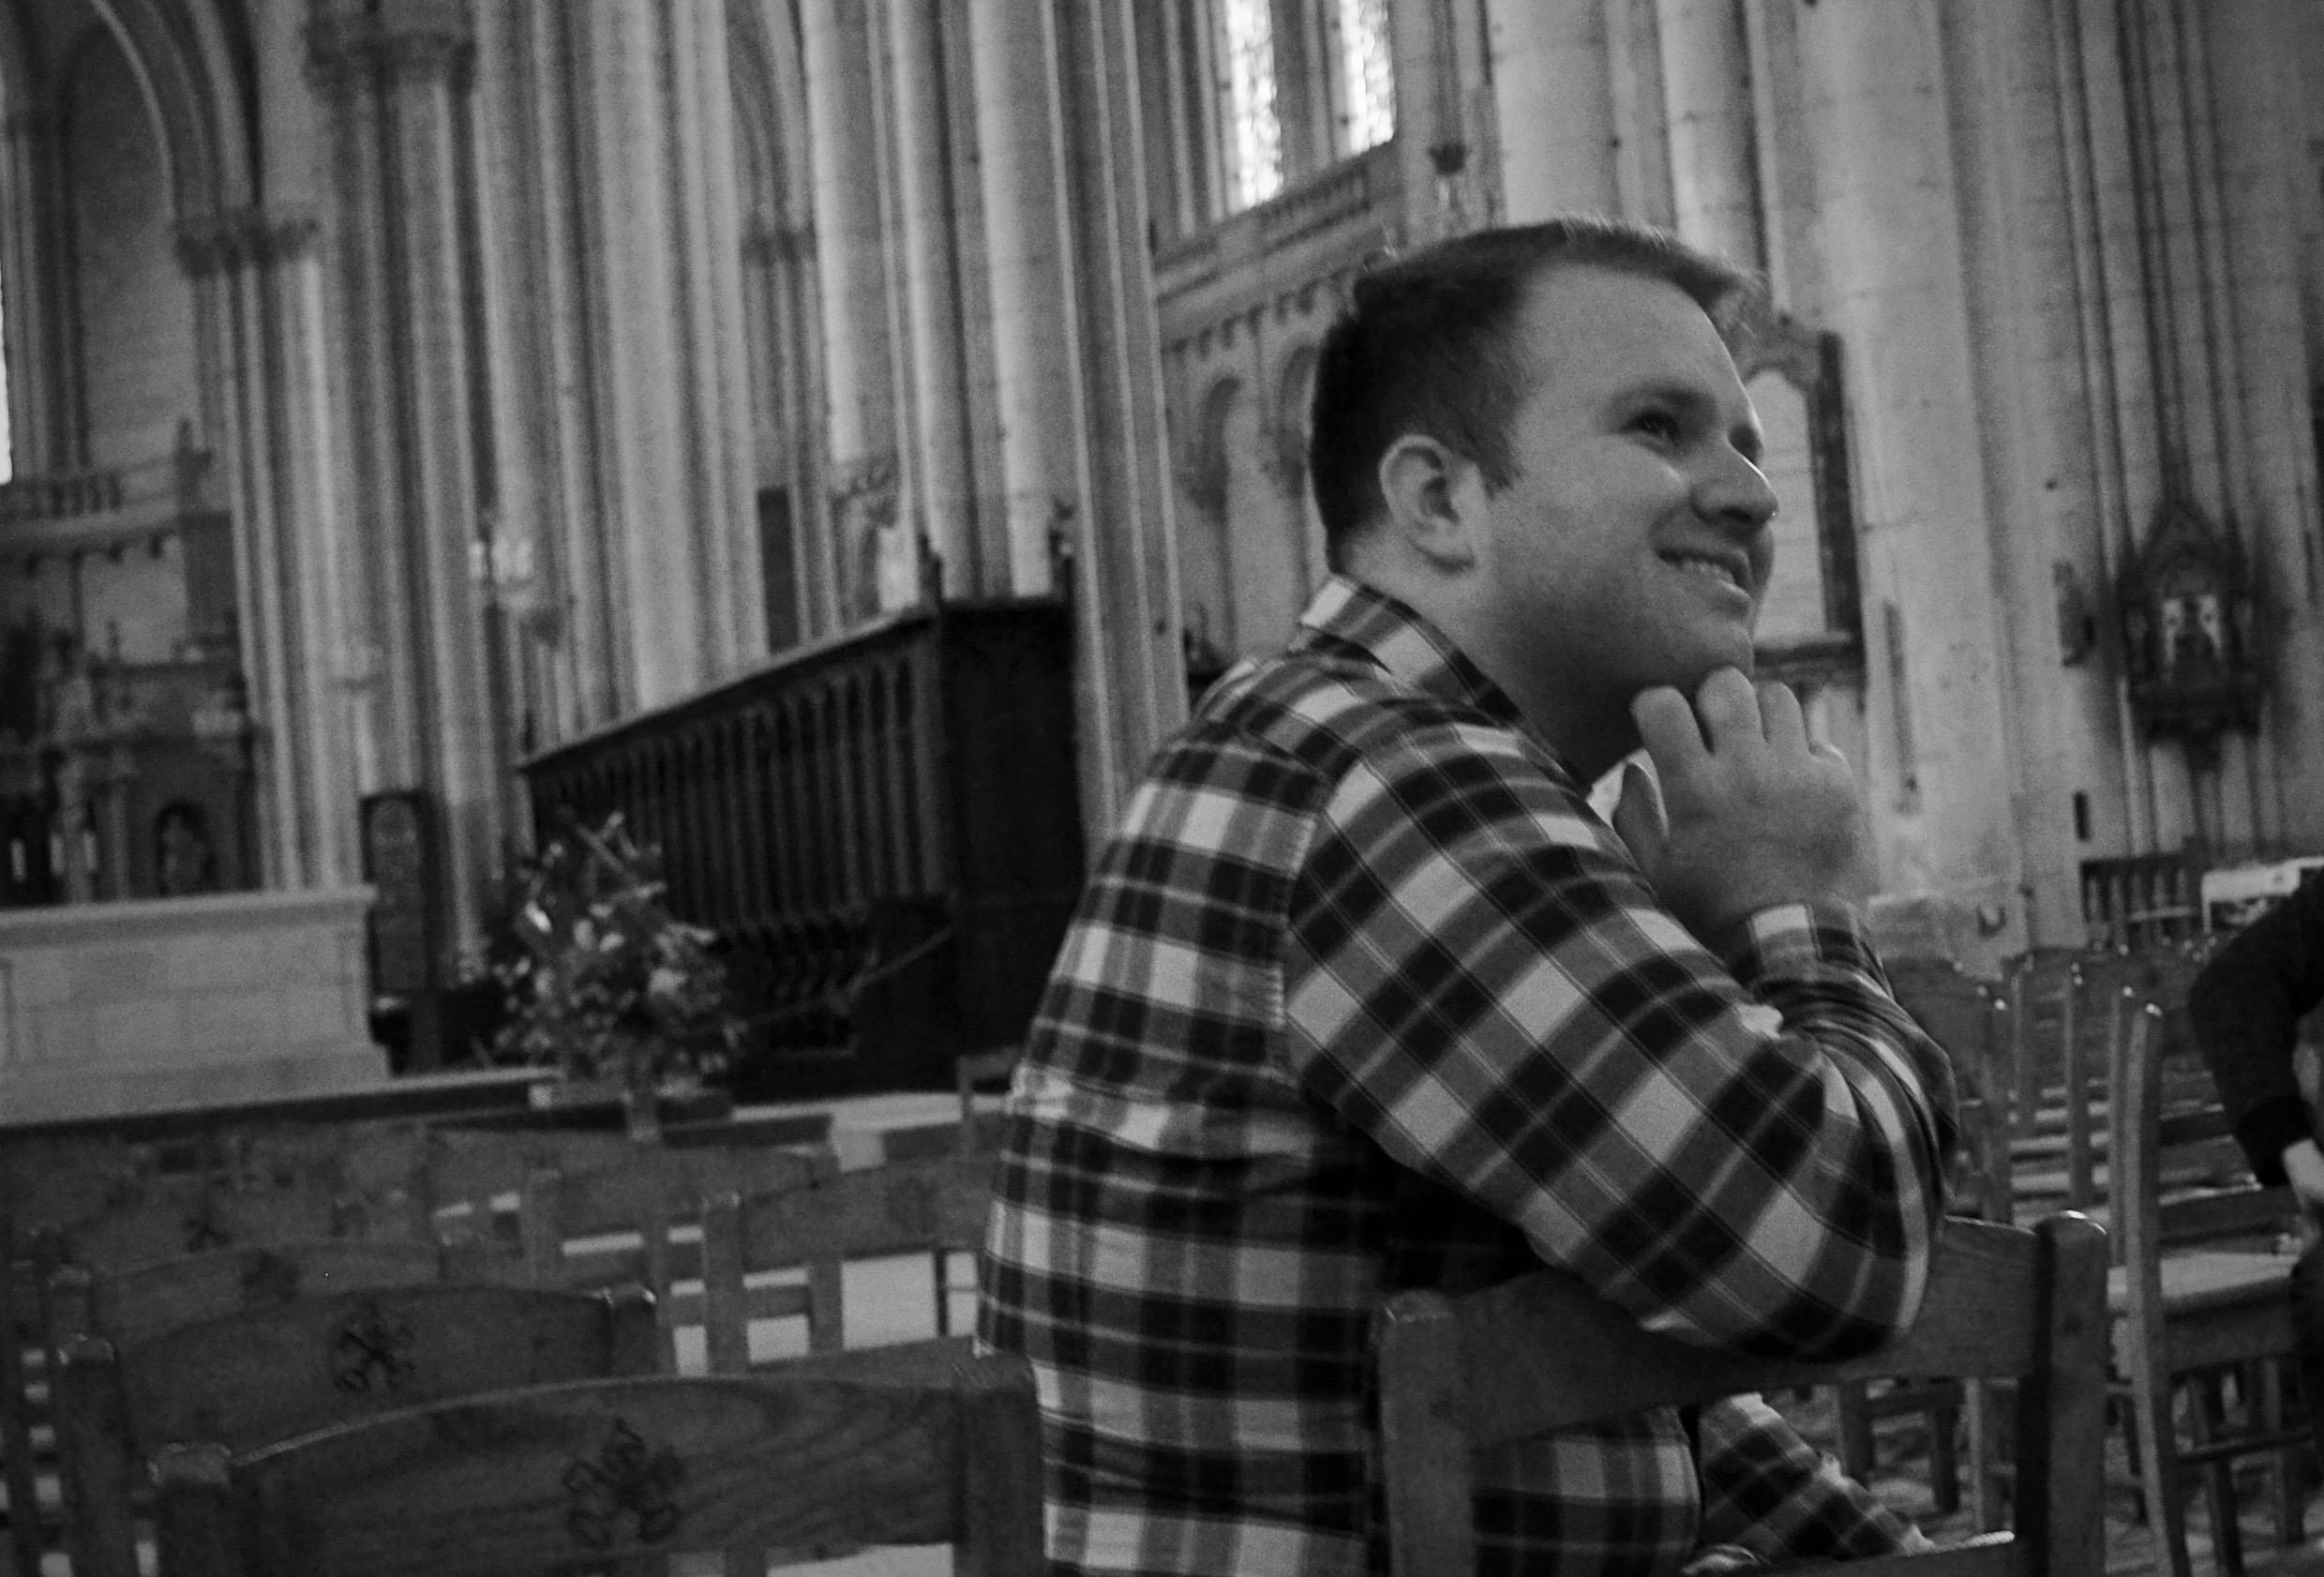 Billy Porter in Poitiers - Boston Organ Studio